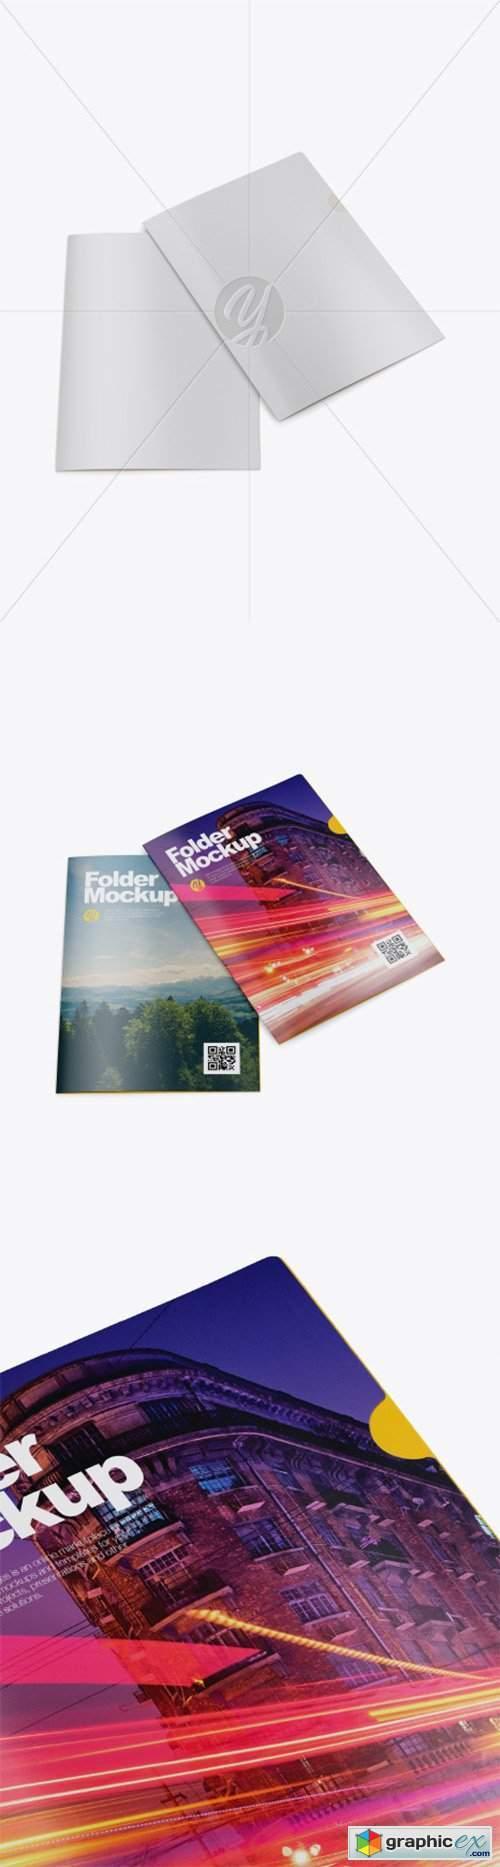 Two Folders Mockup - High-Angle Shot